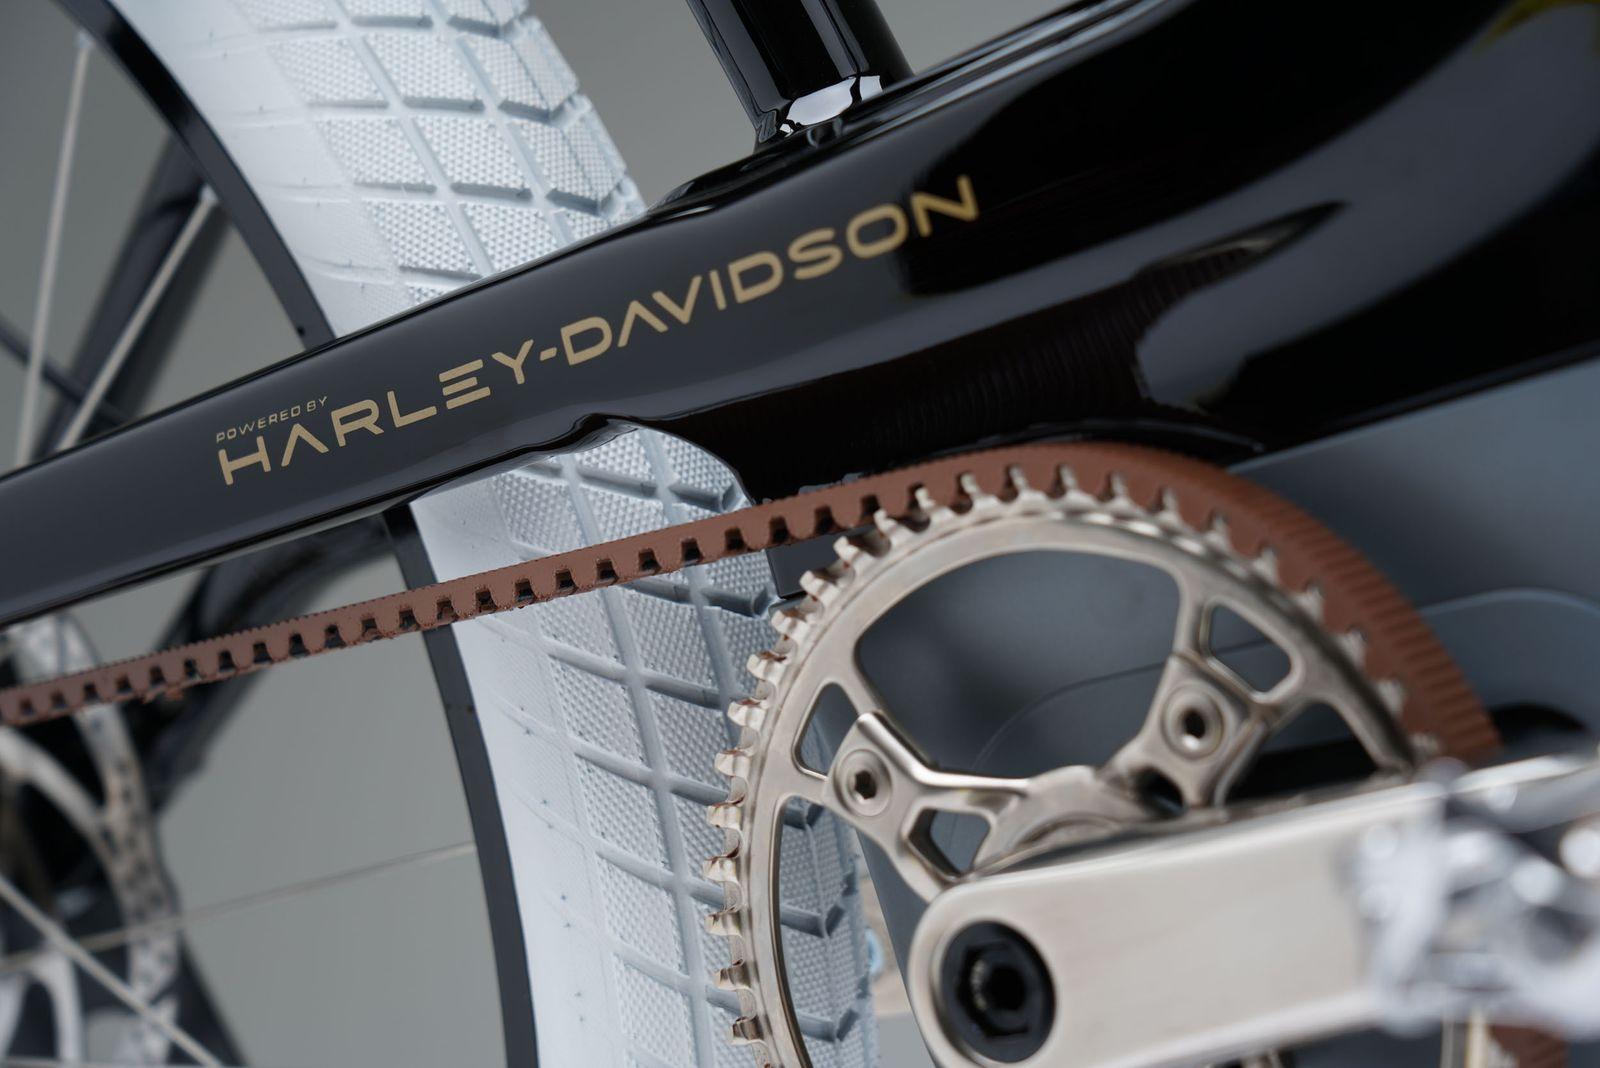 SERIAL 1 - HARLEY-DAVIDSON